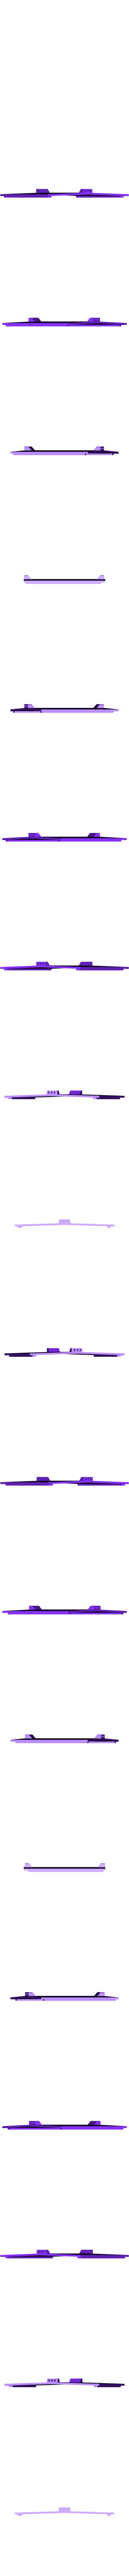 G toiture cabine.STL Download STL file Draisine Matisa for LGB • 3D printable object, biddle